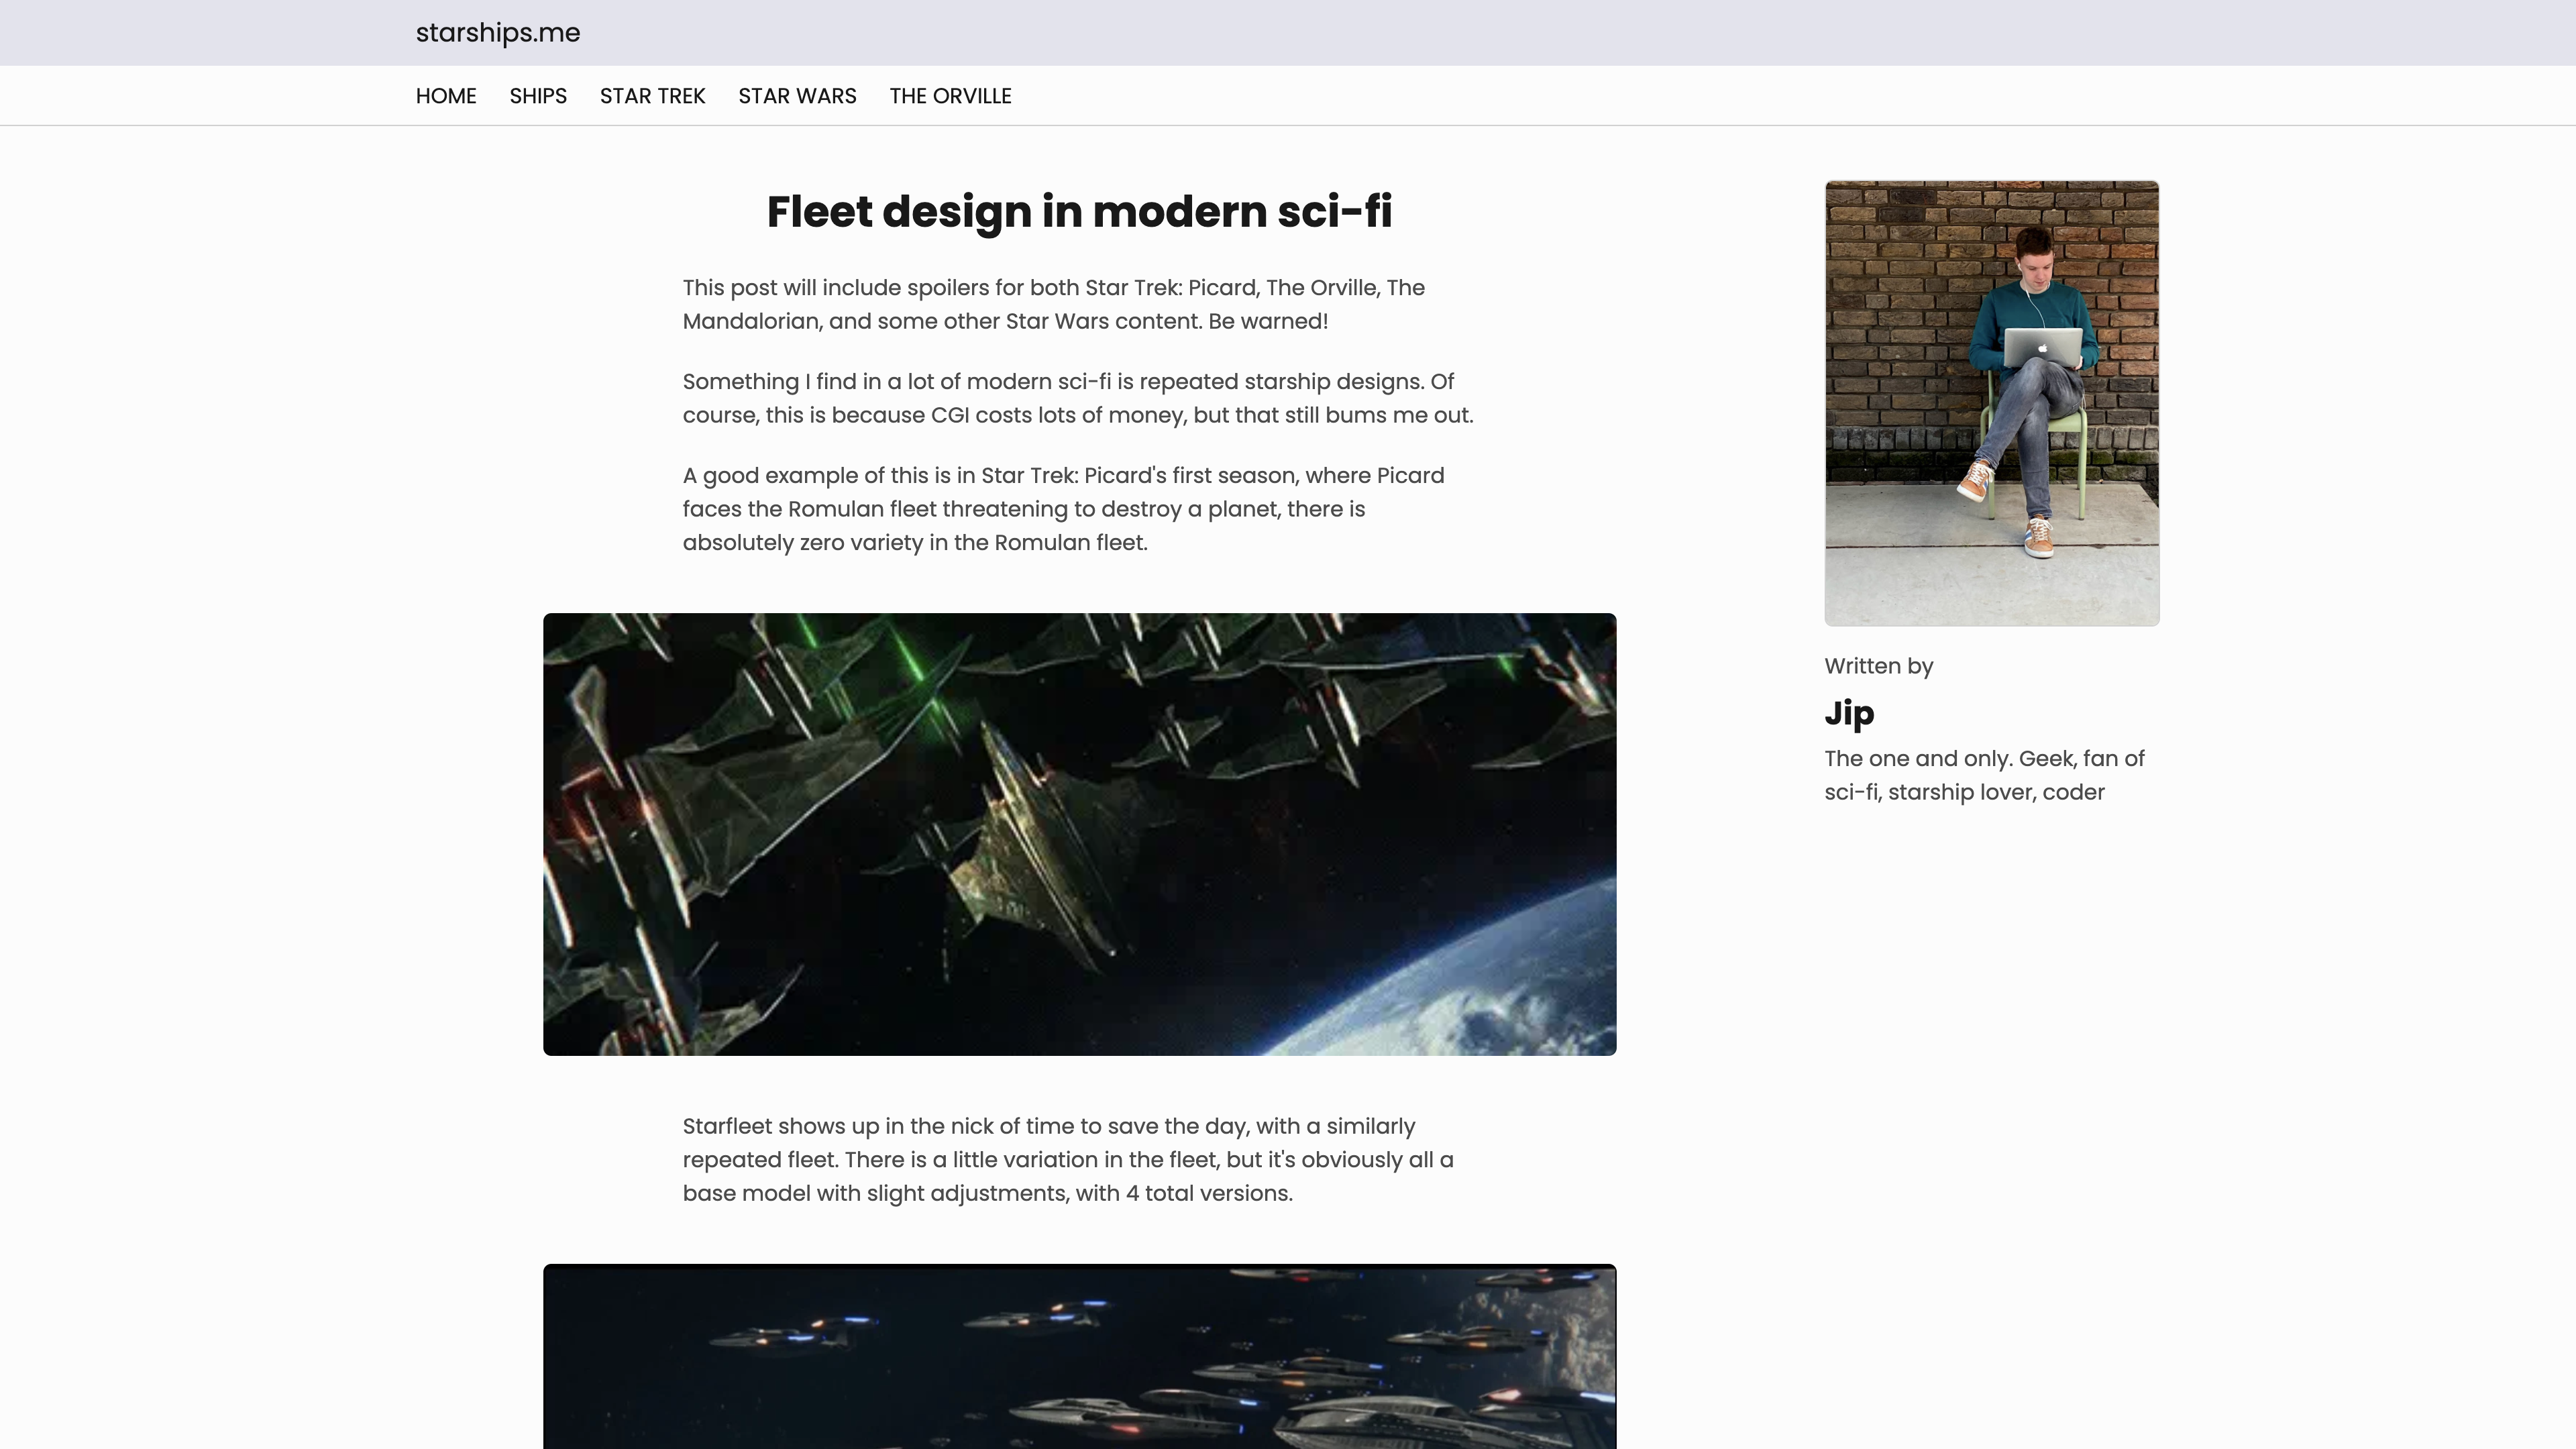 Starships blog page: 'fleet design in modern sci-fi'